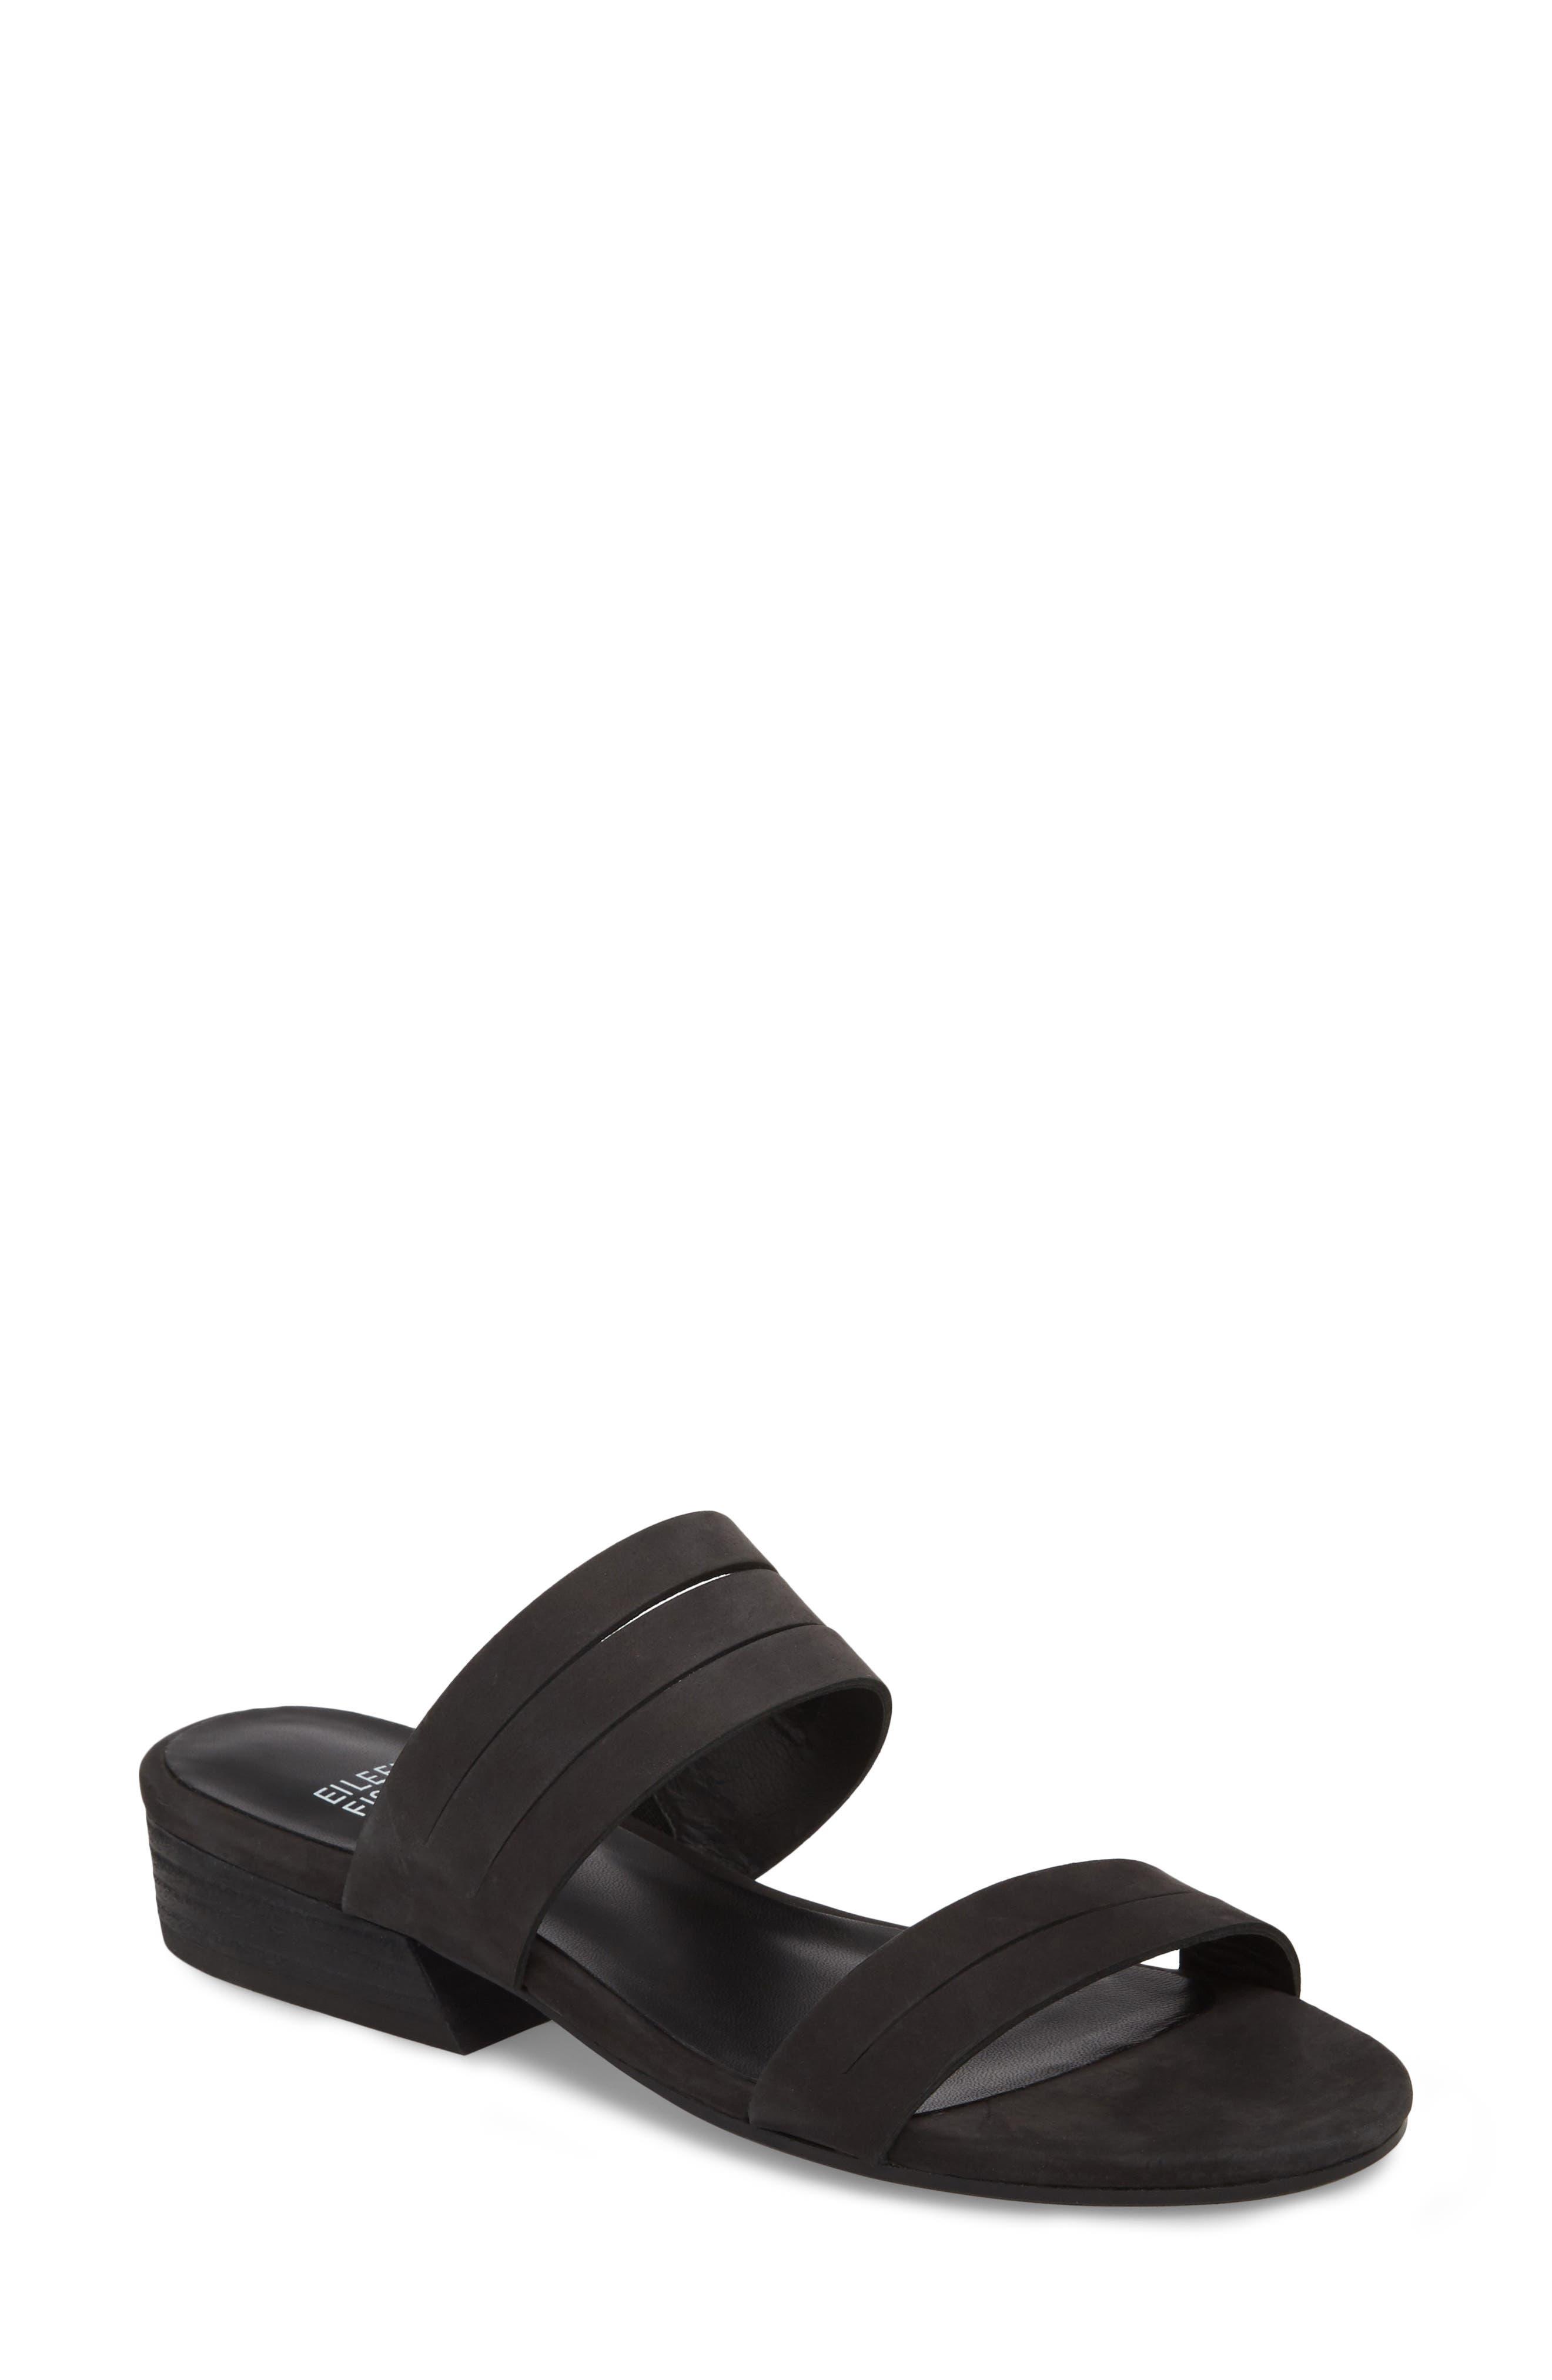 Finch Slide Sandal,                         Main,                         color, 001